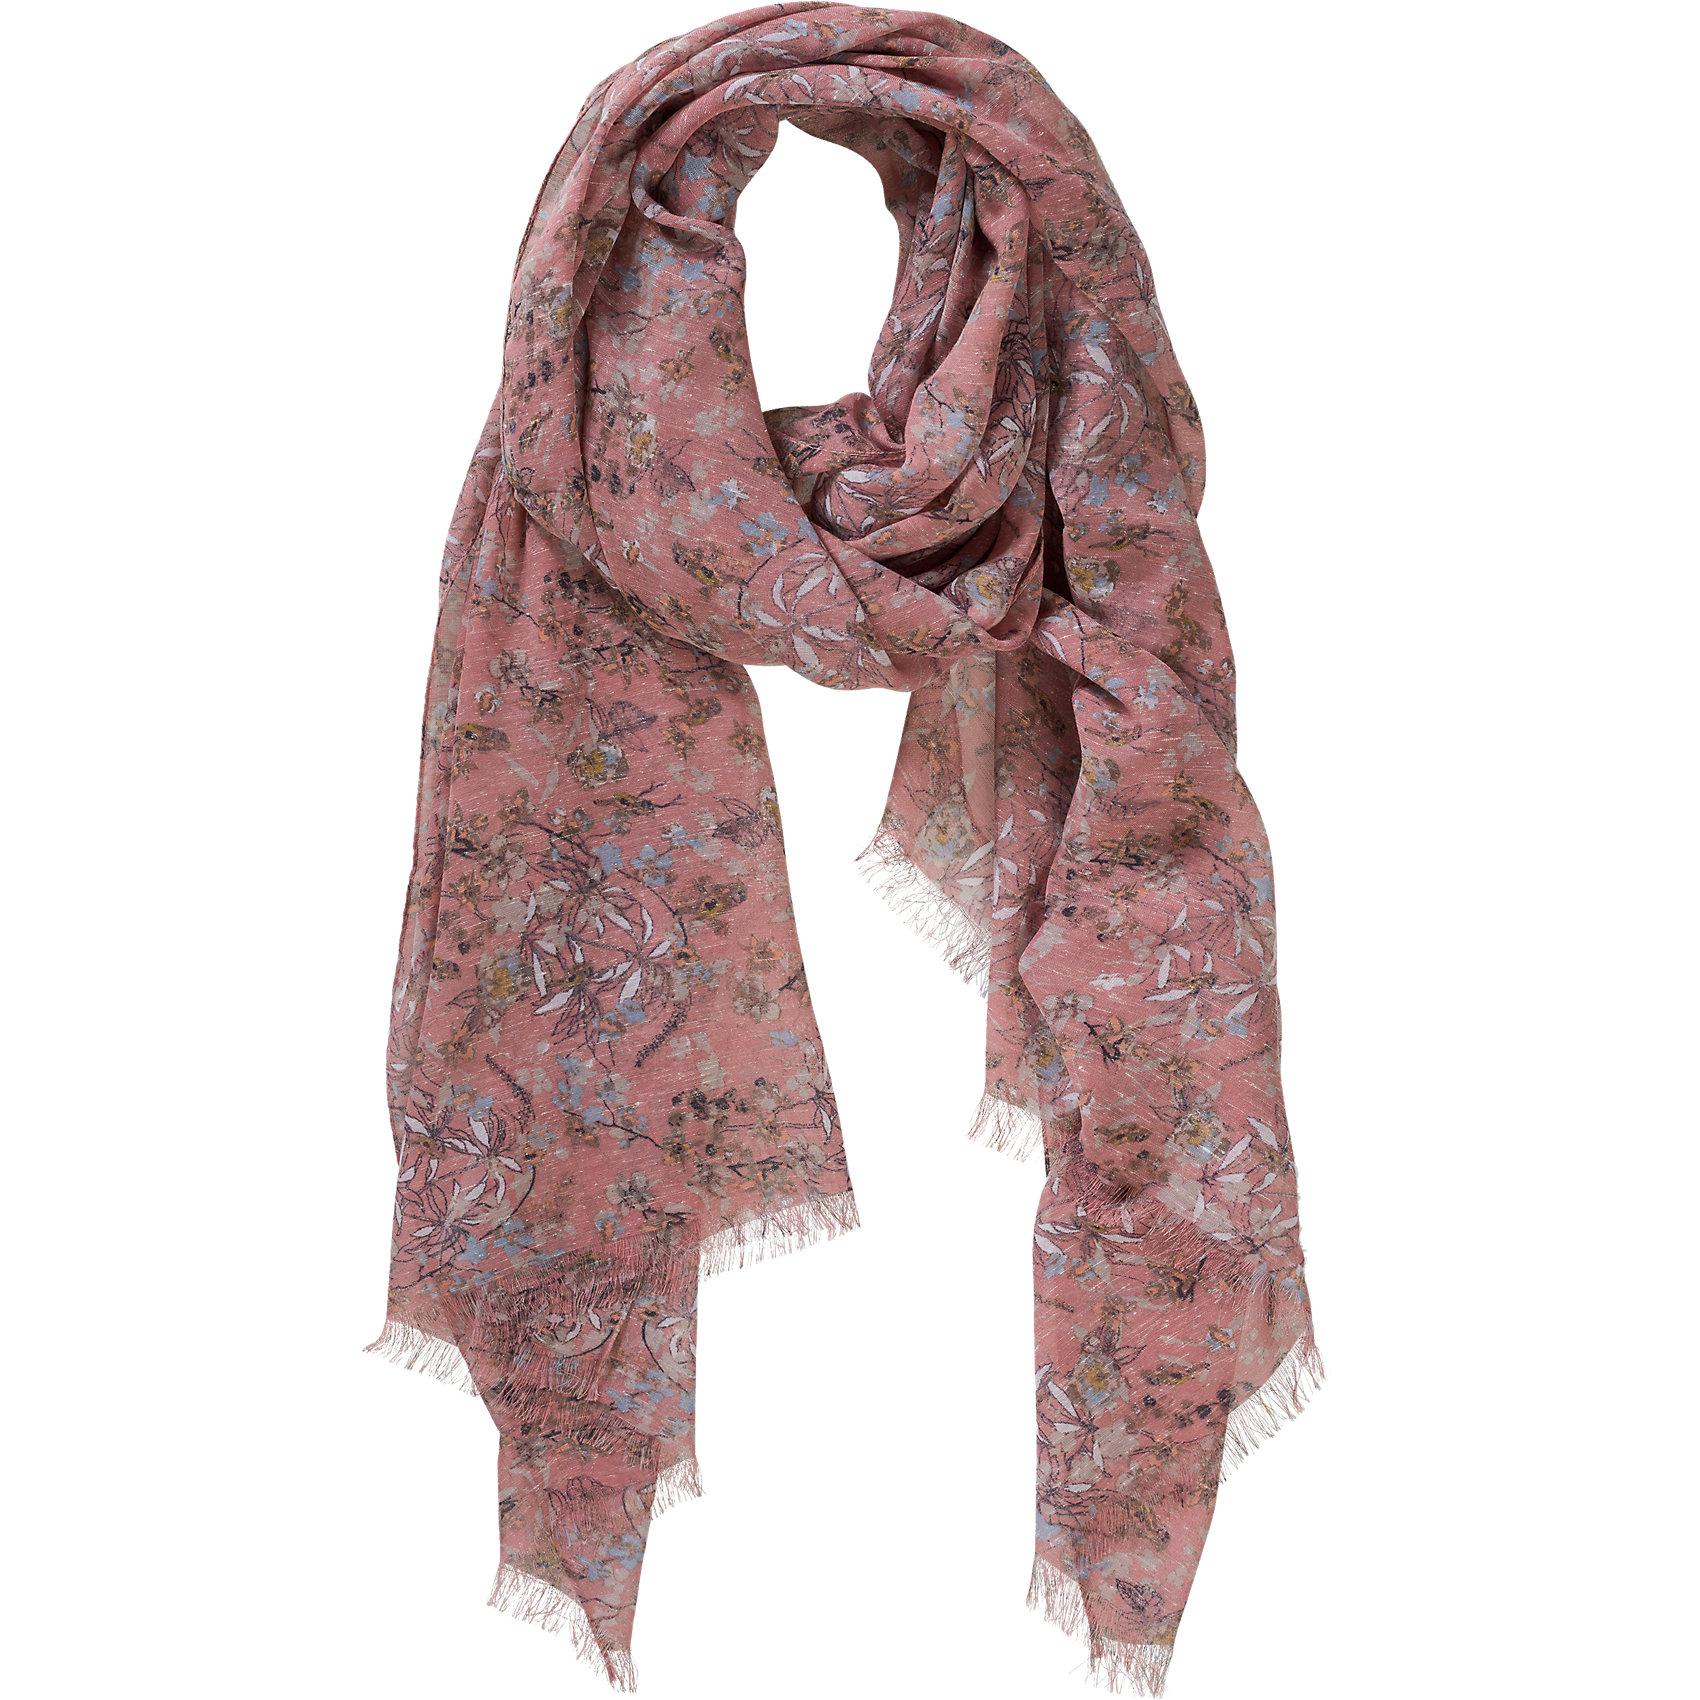 Neu-TOM-TAILOR-Schal-5117678-fuer-Damen-rosa